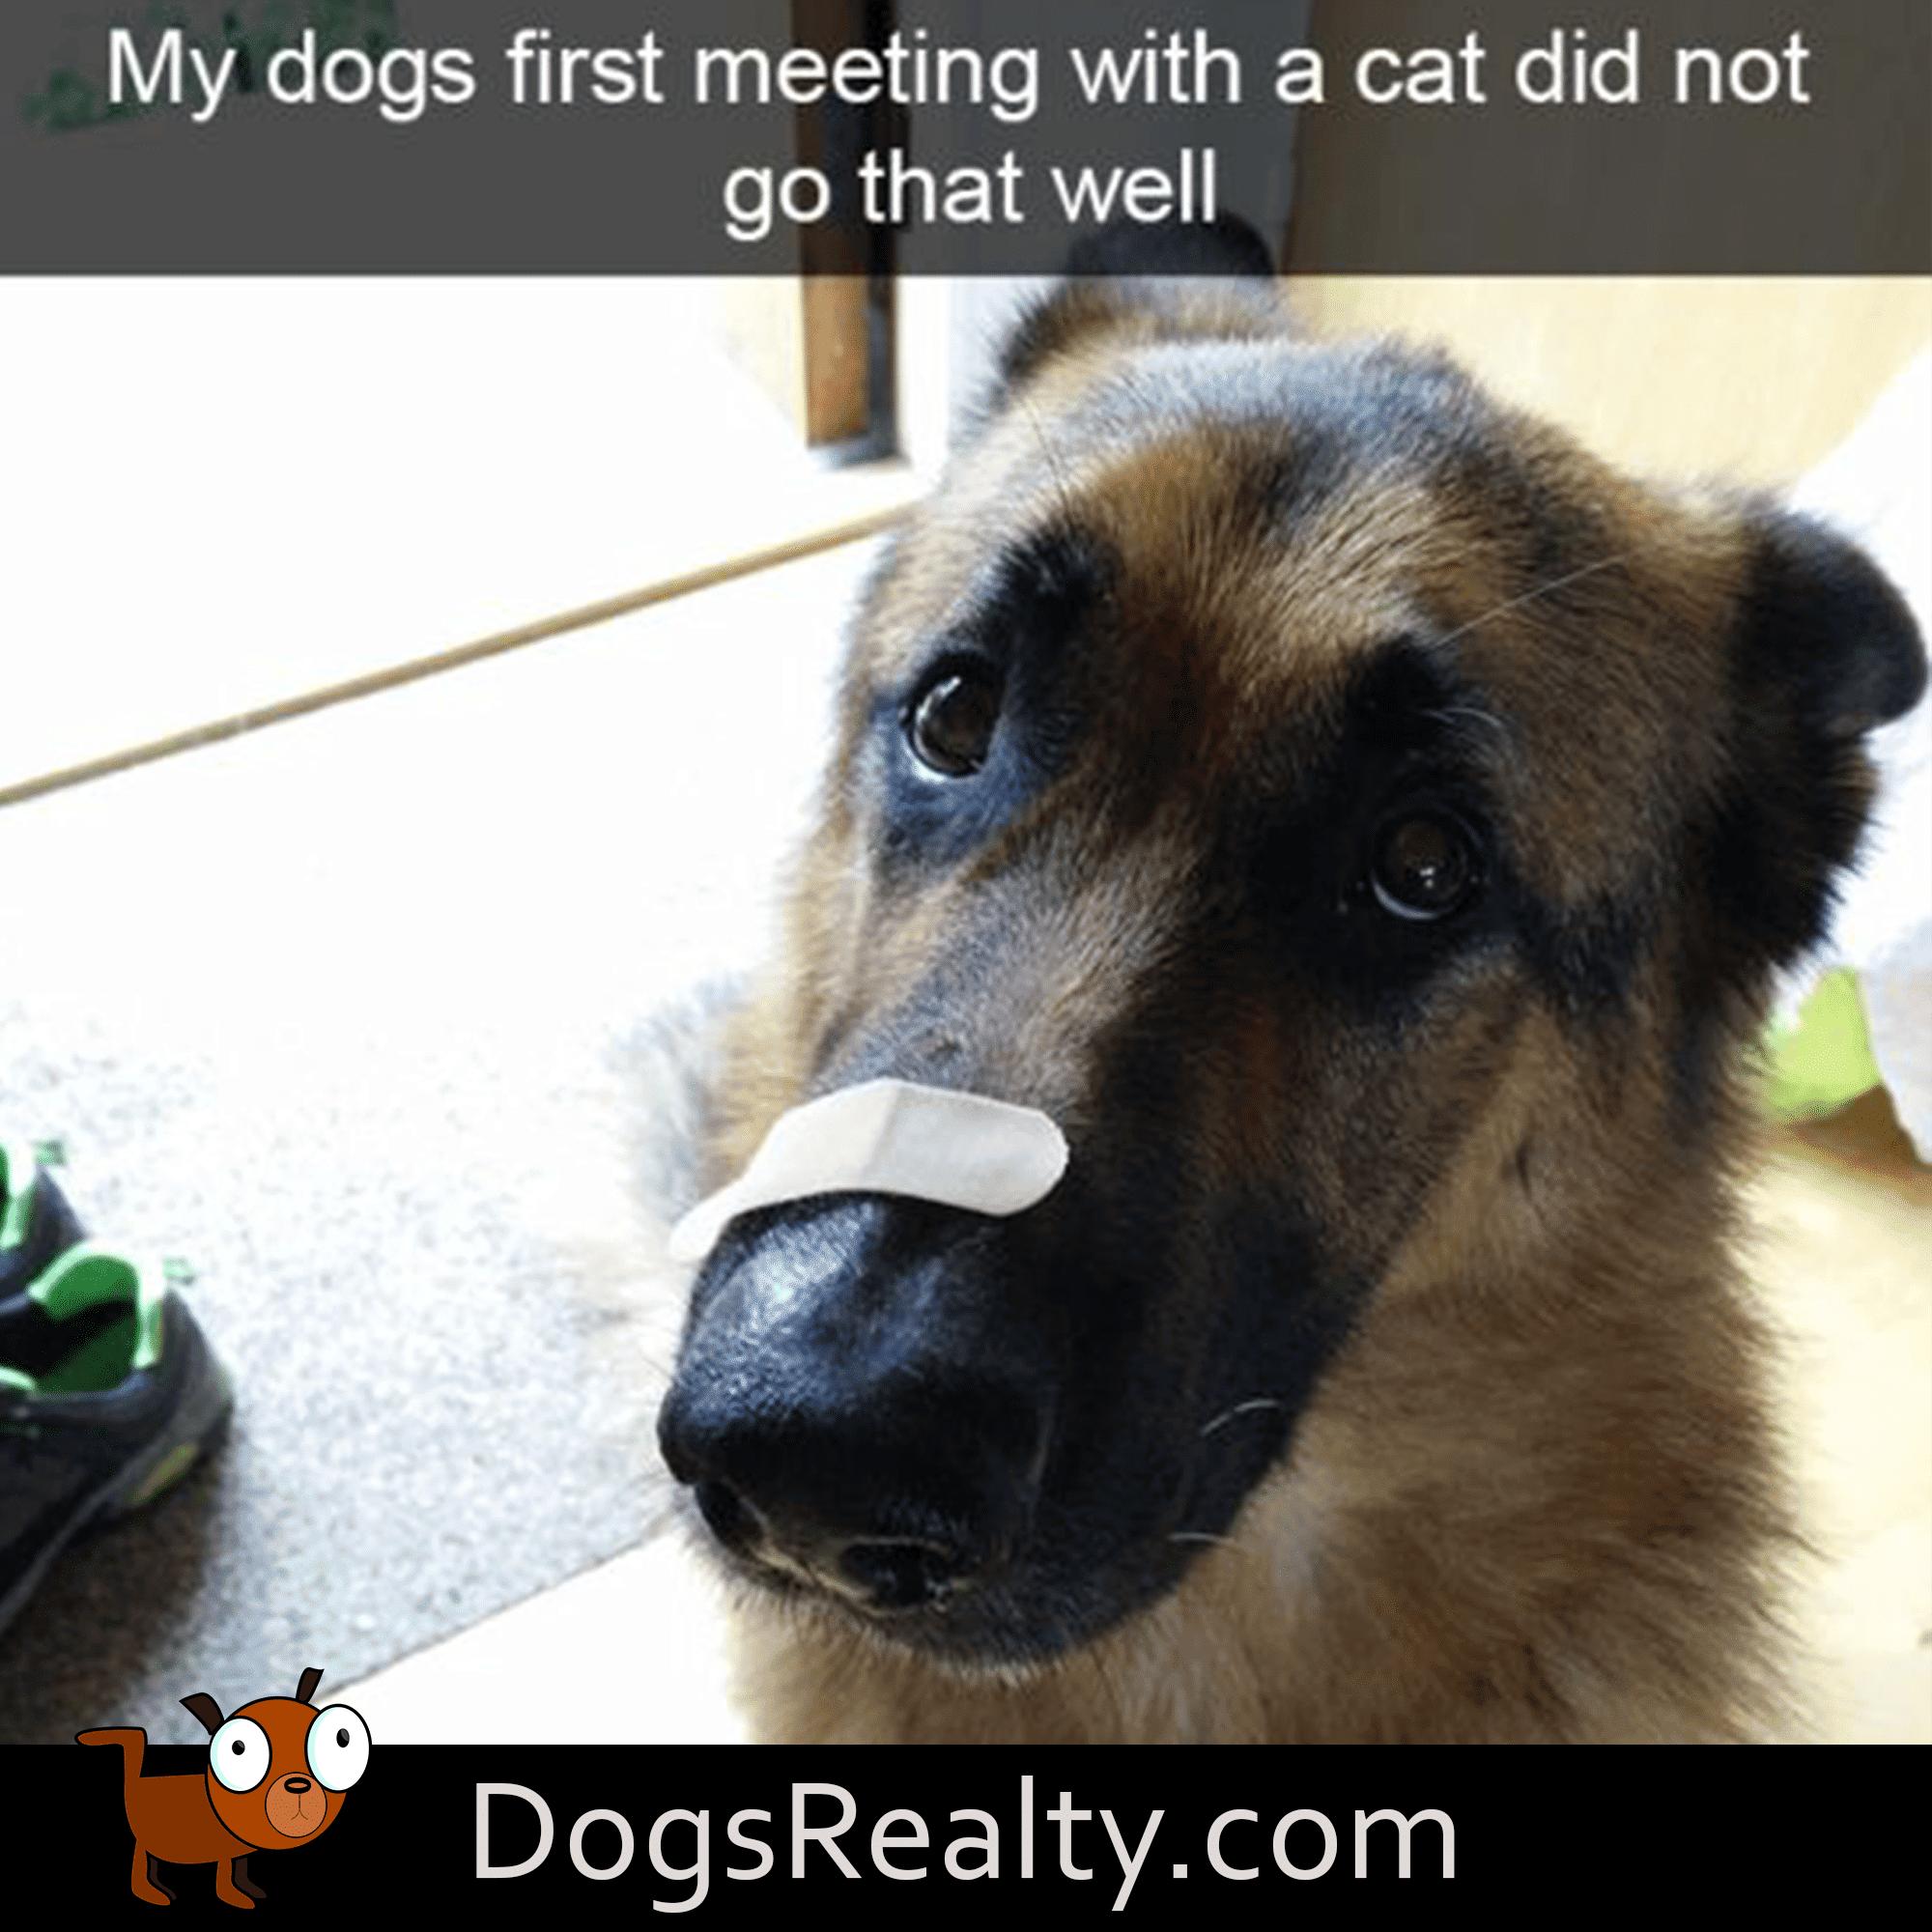 dog meme cat meeting didn't go well